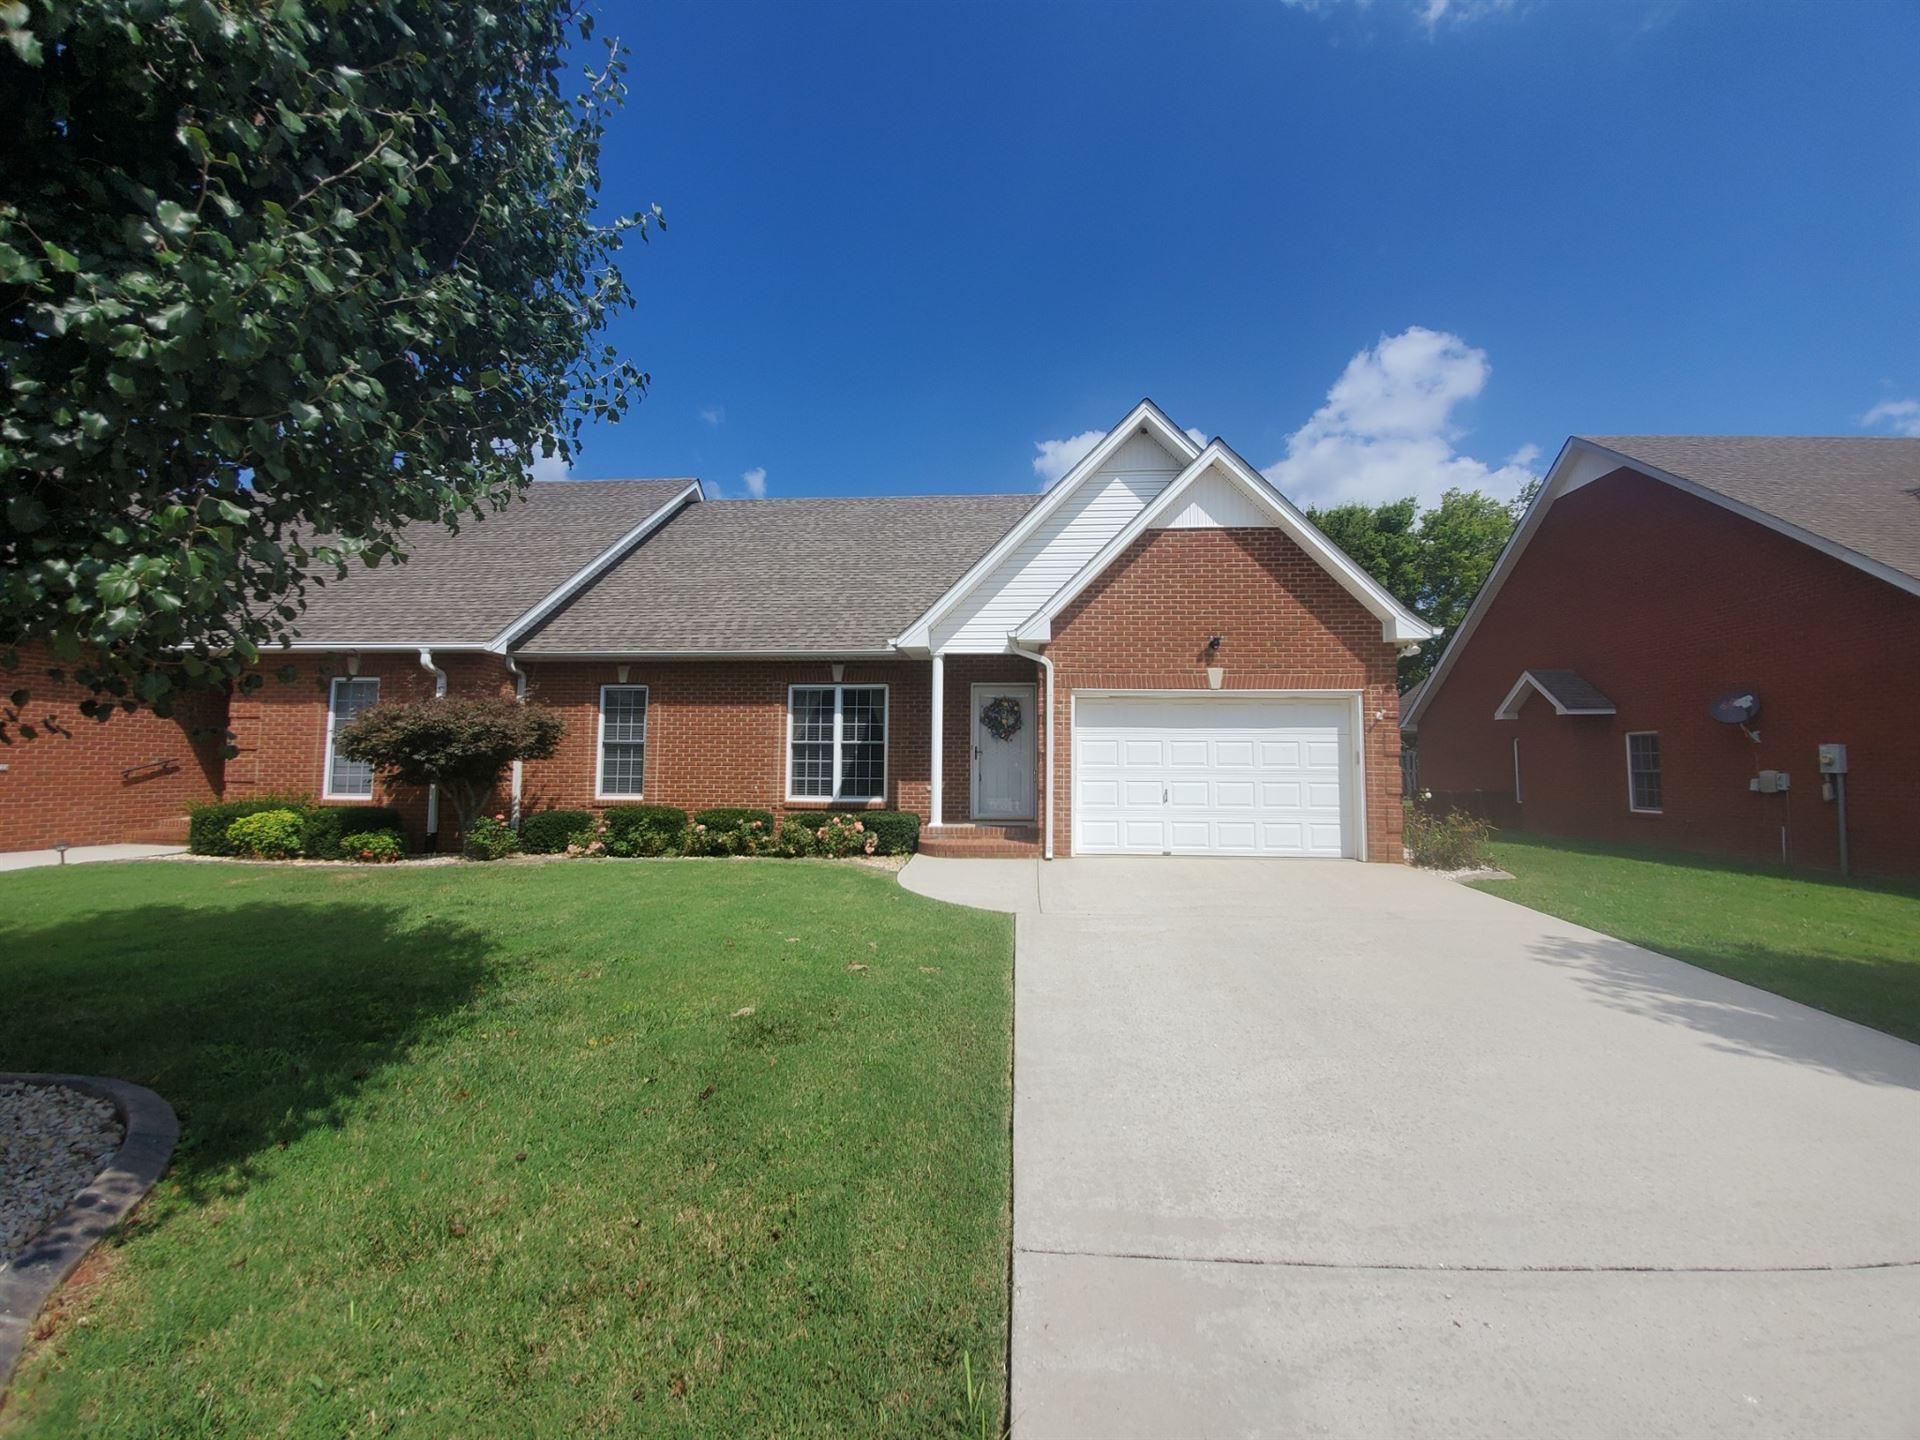 400 Chase Cir, Winchester, TN 37398 - MLS#: 2289267